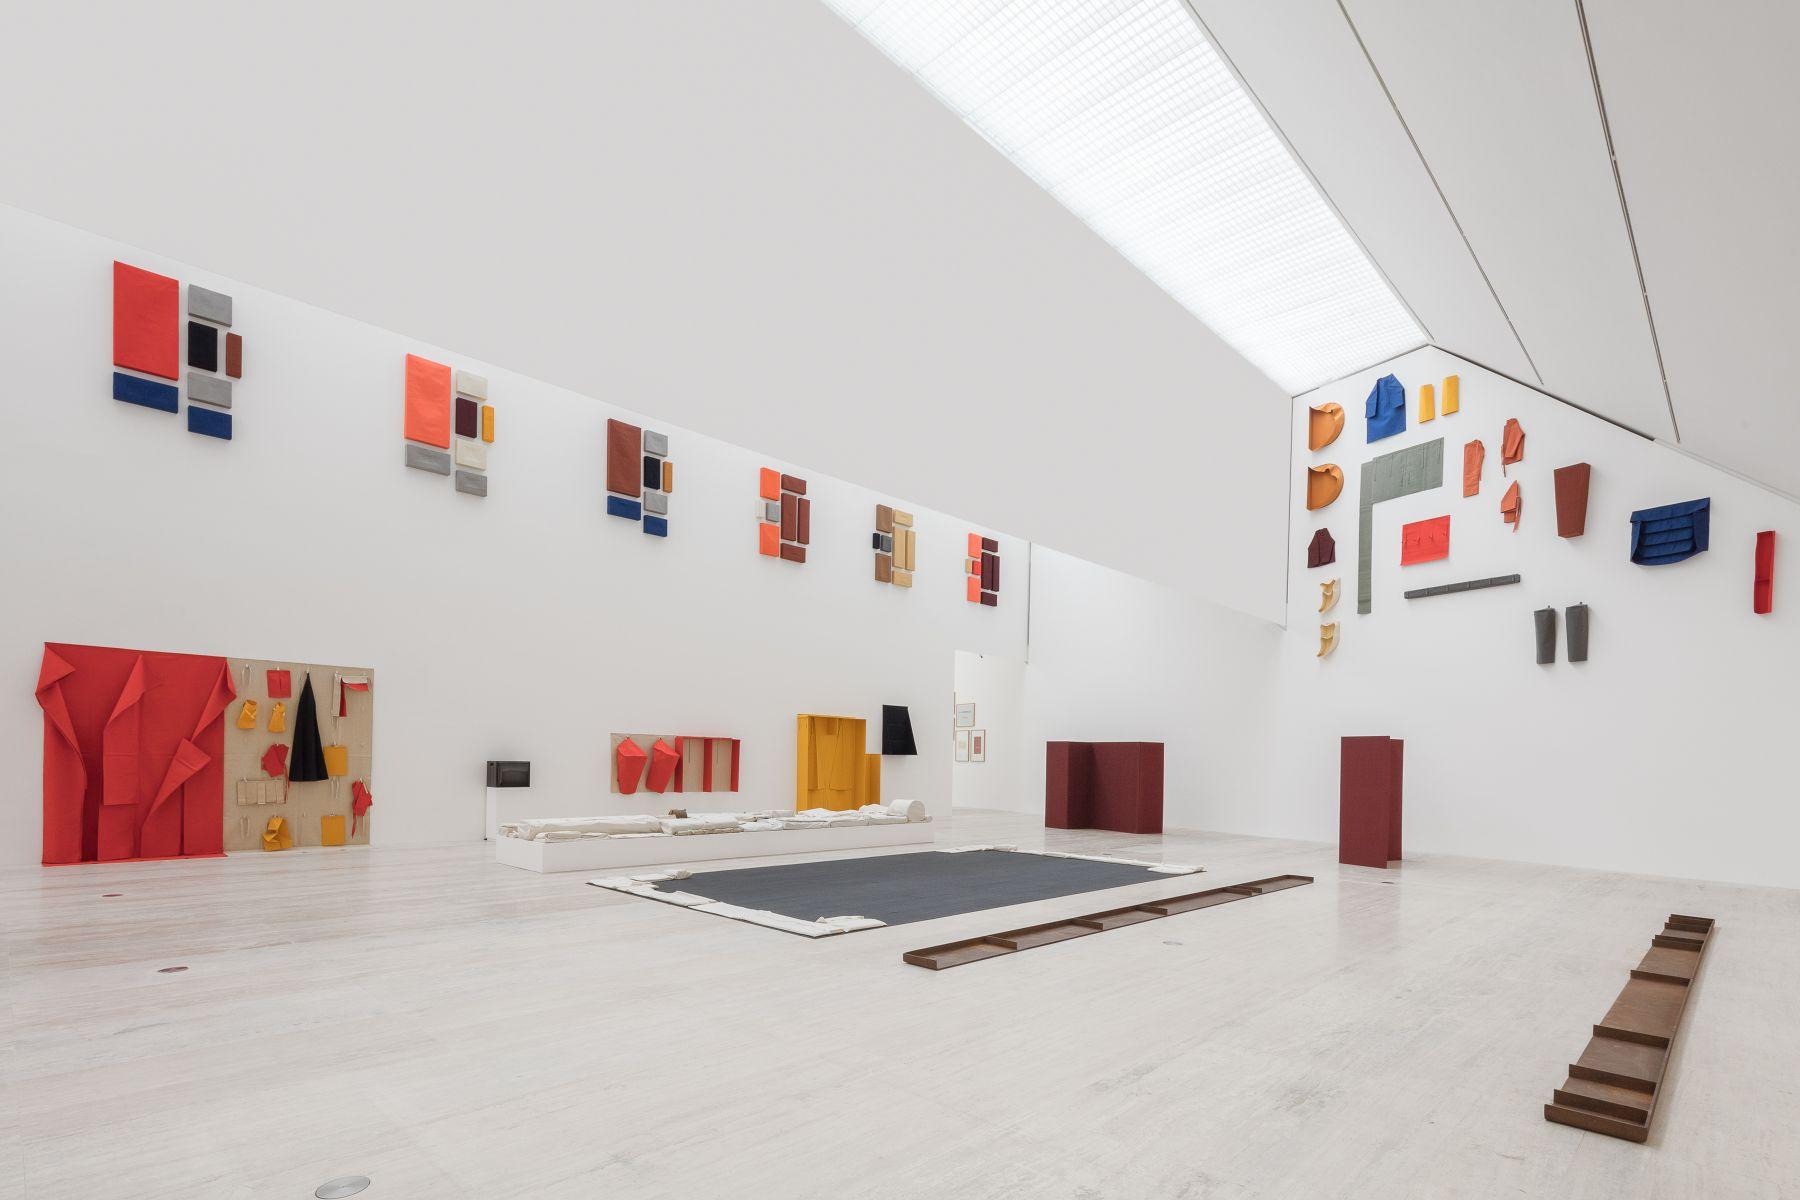 Franz Erhard Walther, Fundacion Jumex Arte Contemporaneo, Mexico City.